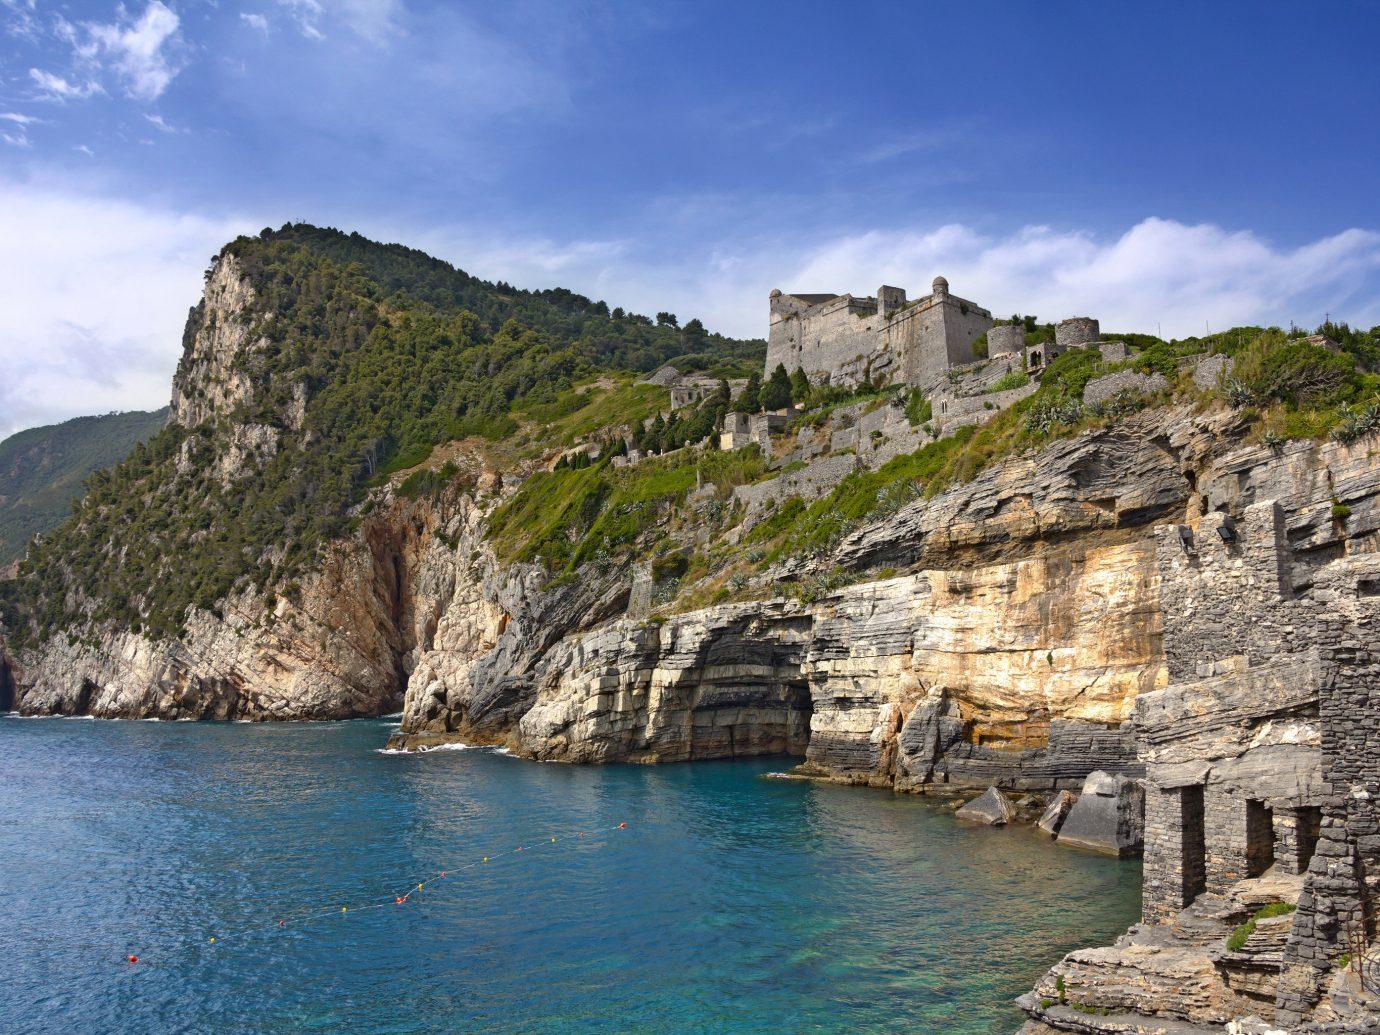 Italy Trip Ideas Coast Sea cliff coastal and oceanic landforms sky promontory headland terrain rock bay klippe cape cove escarpment tourism formation water stack inlet